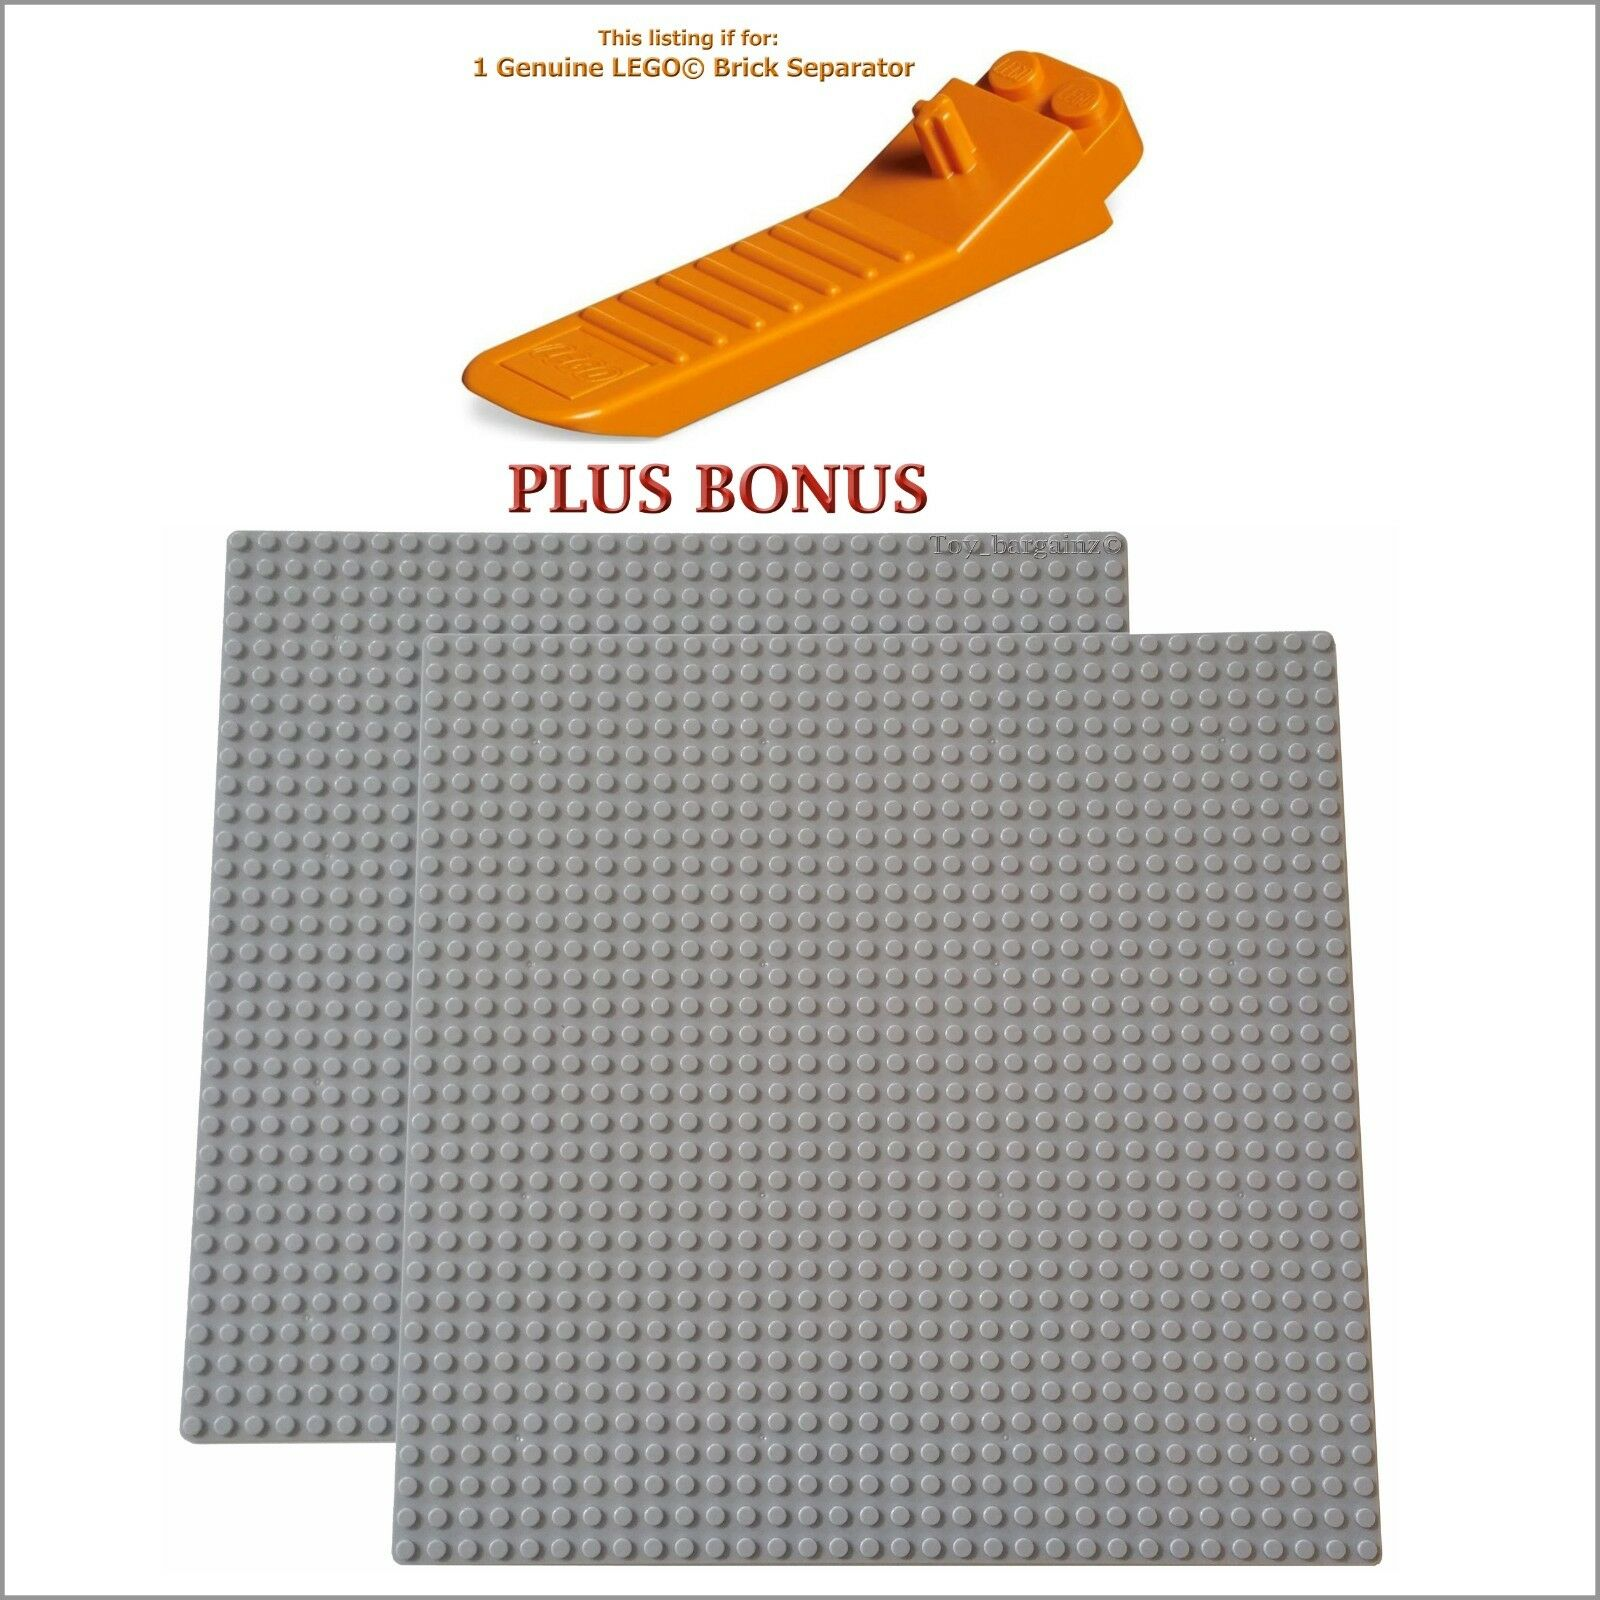 1 LEGO Minifigure Head PLUS 2 Grey 10x10-inch 32x32-stud compatible base plates